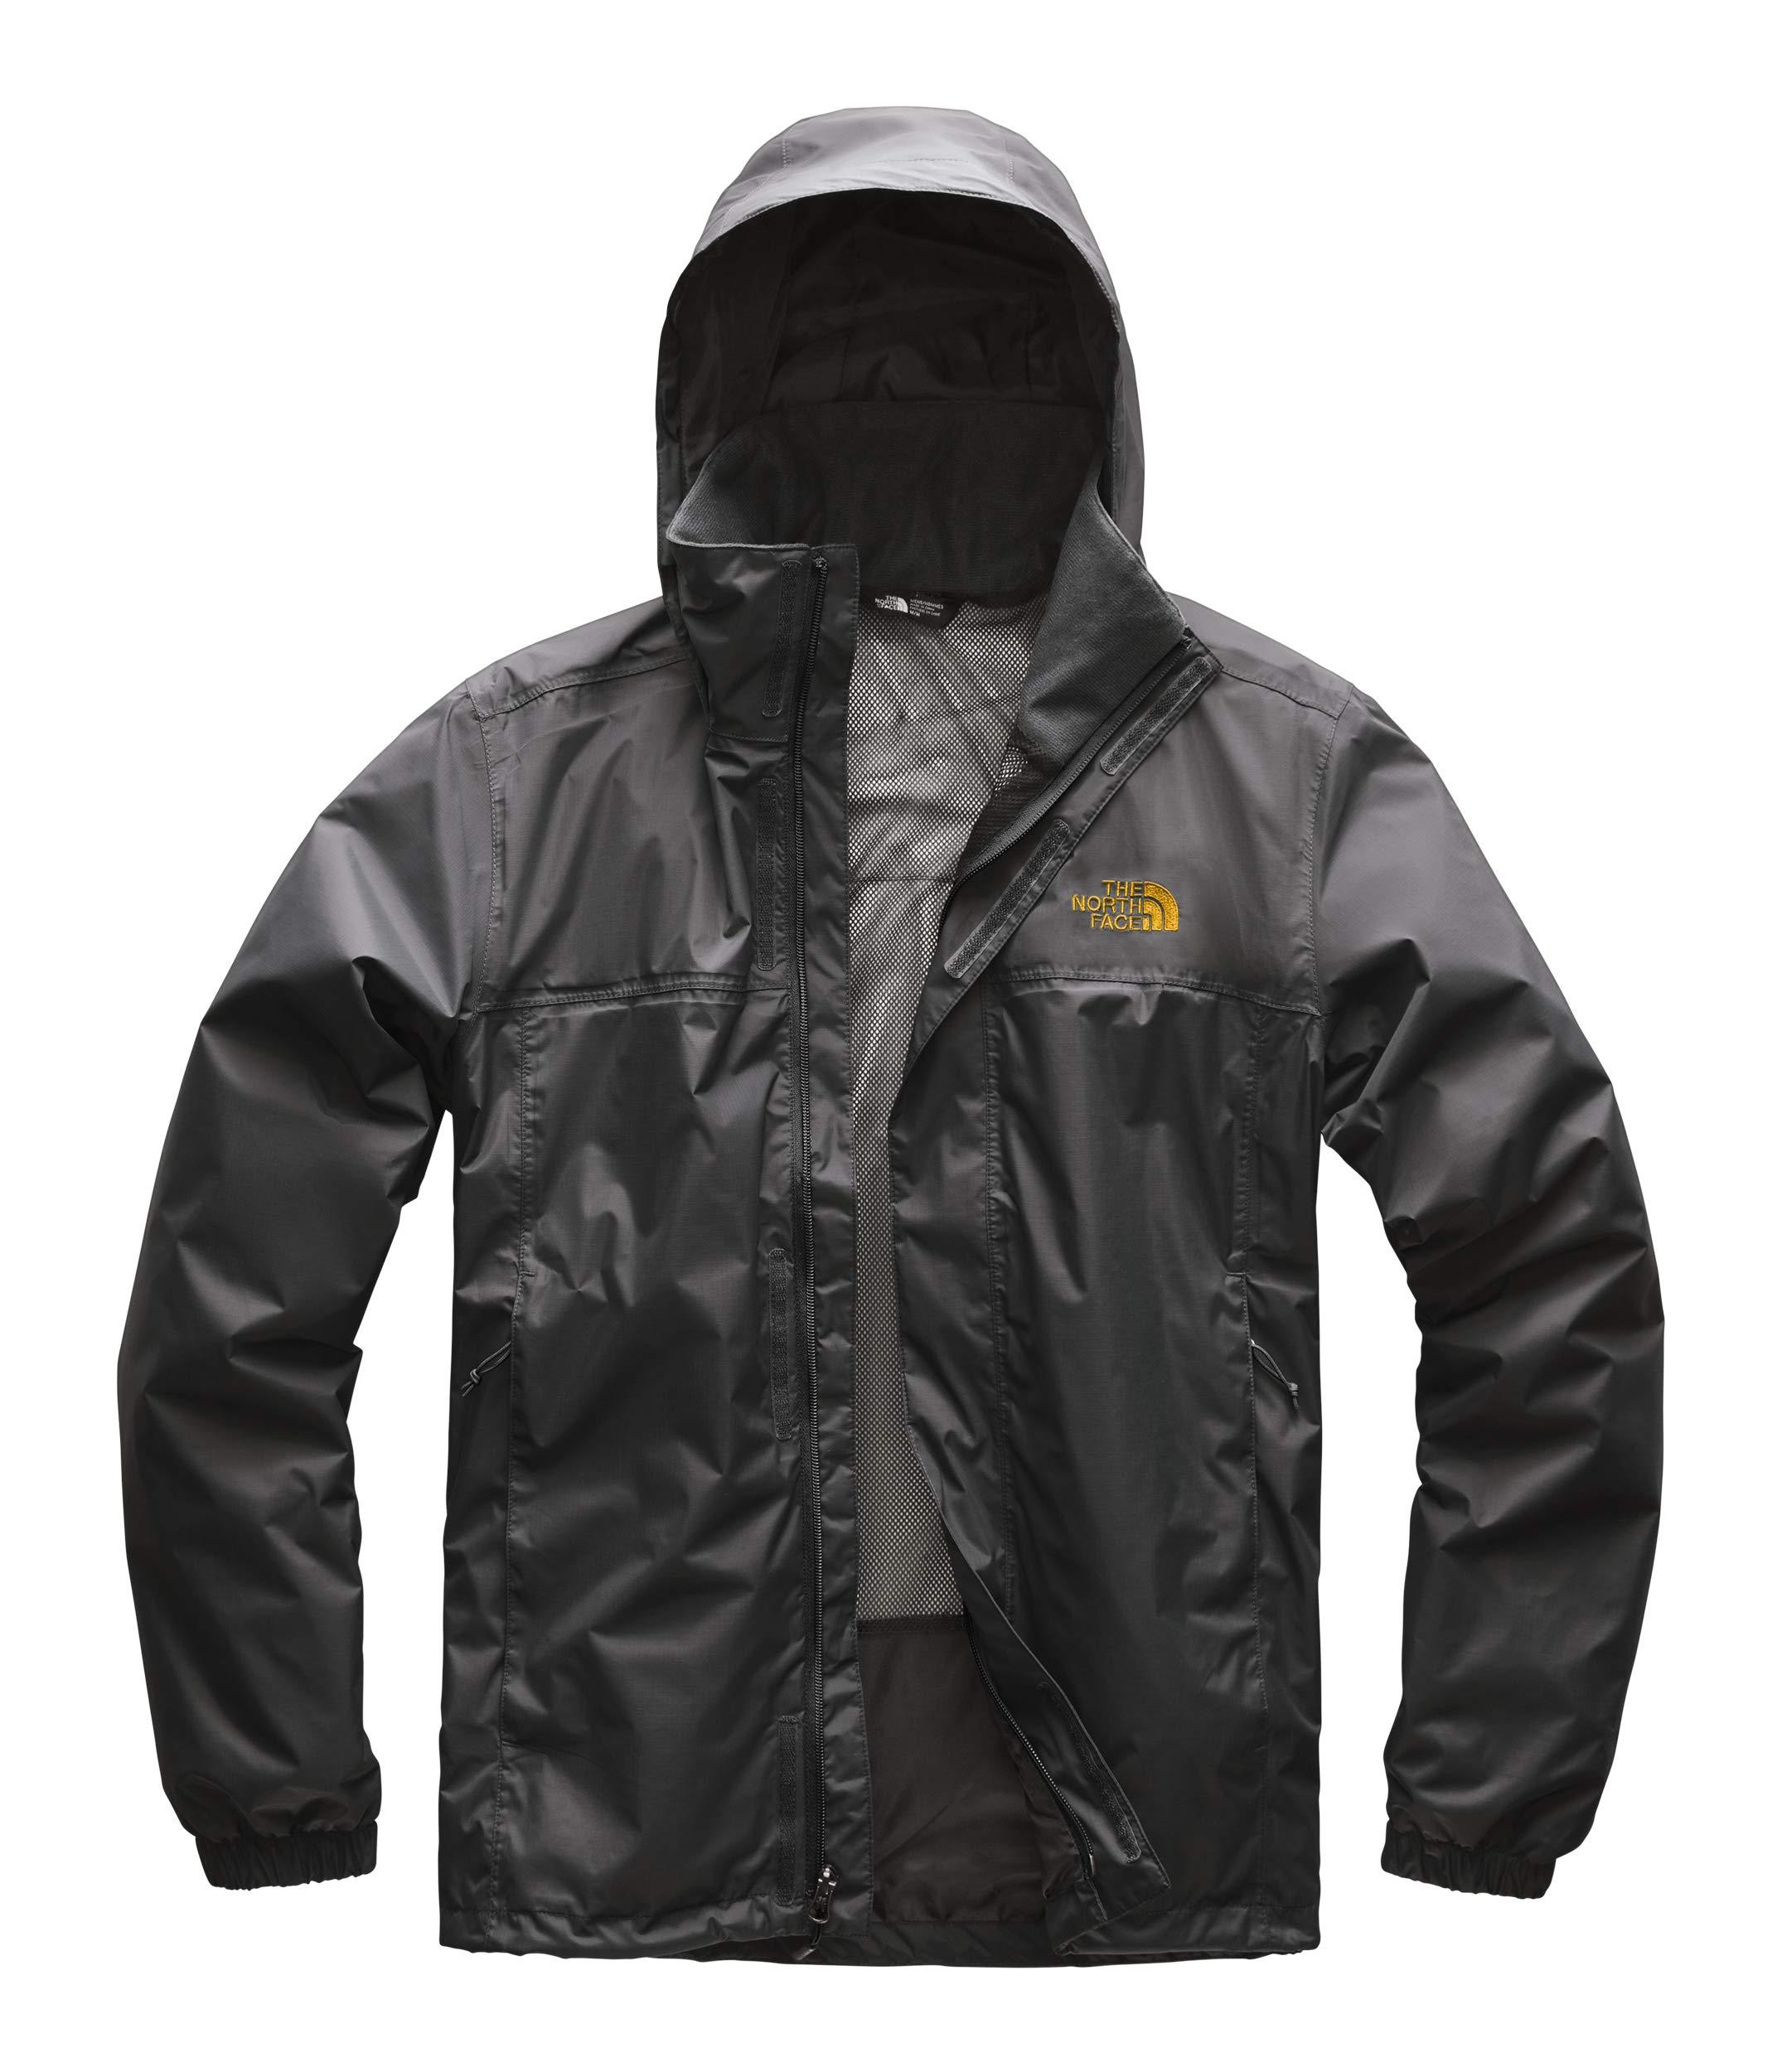 The North Face Men's Resolve 2 Jacket Asphalt Grey/Zinnia Orange Small